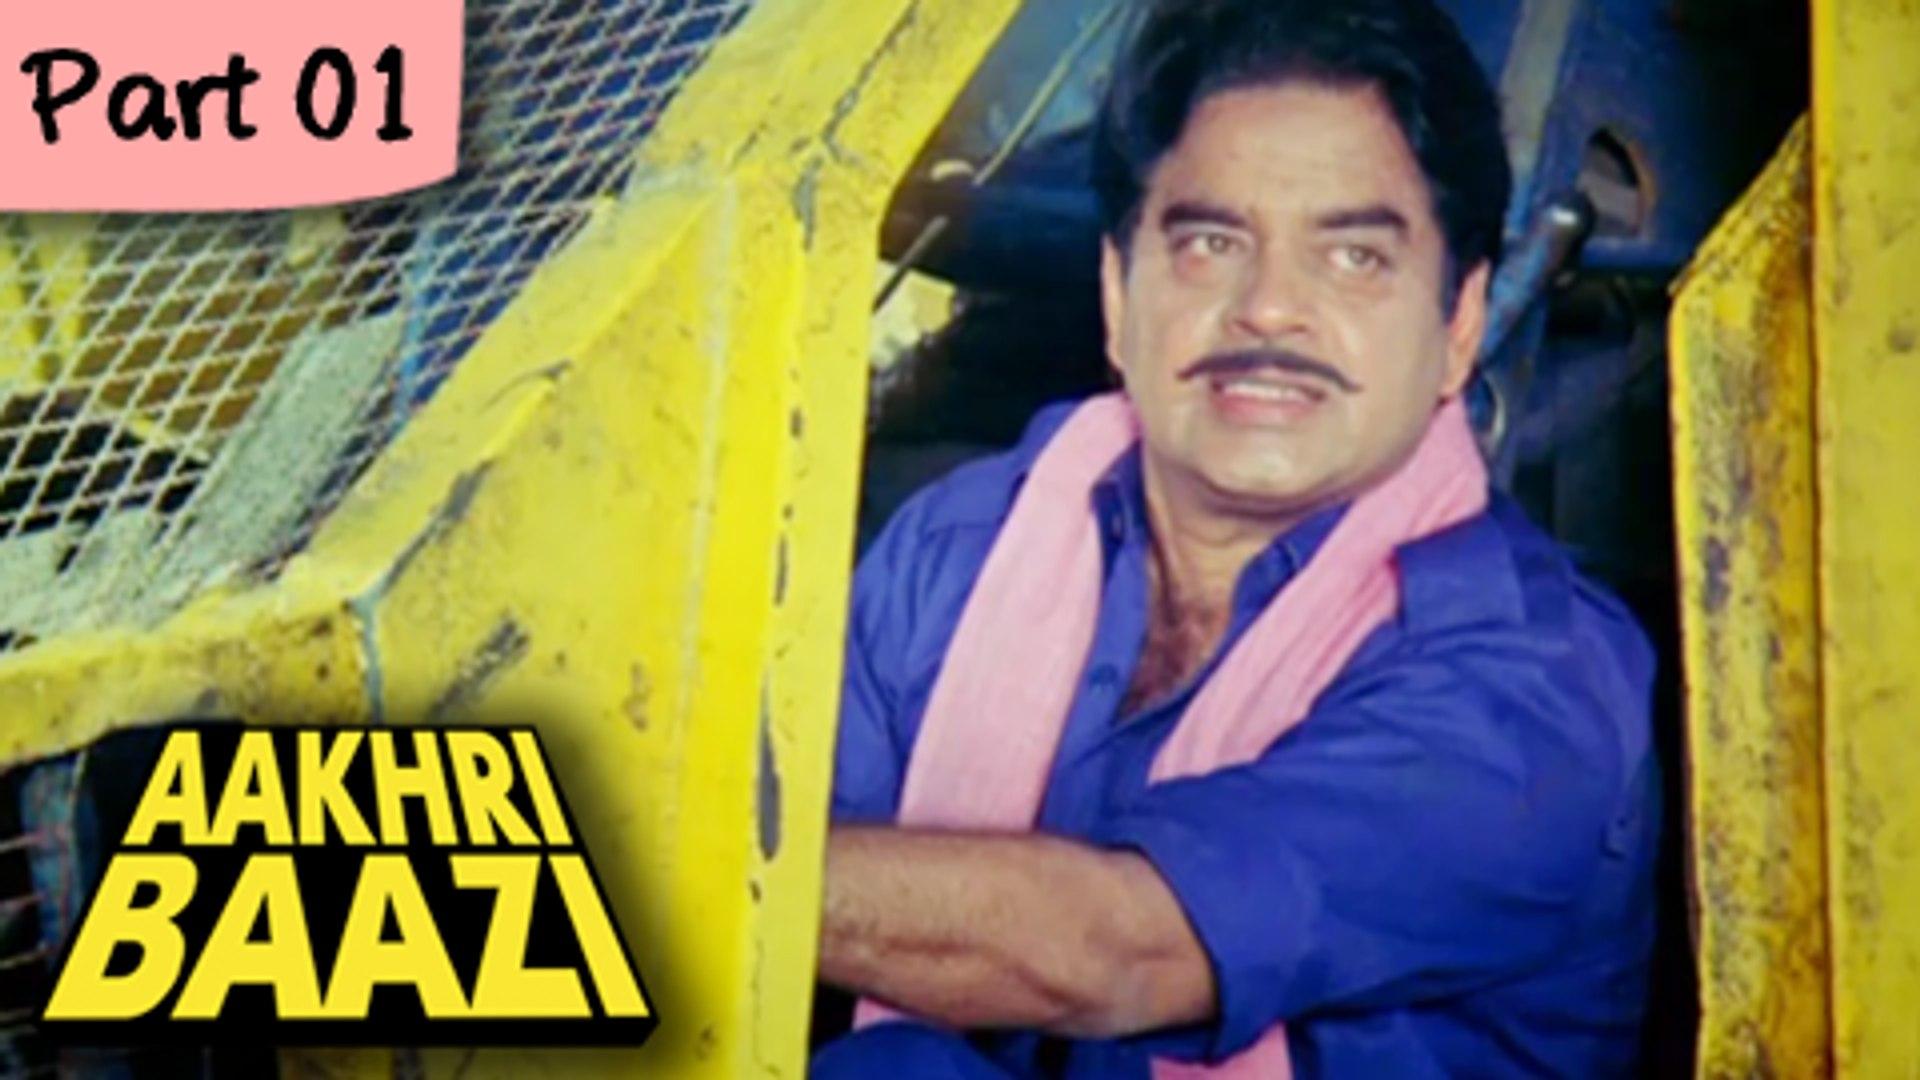 Aakhri Baazi - Part 01/13 - Bollywood Hit Romantic Action Movie - Govinda, Shatrughan Sinha